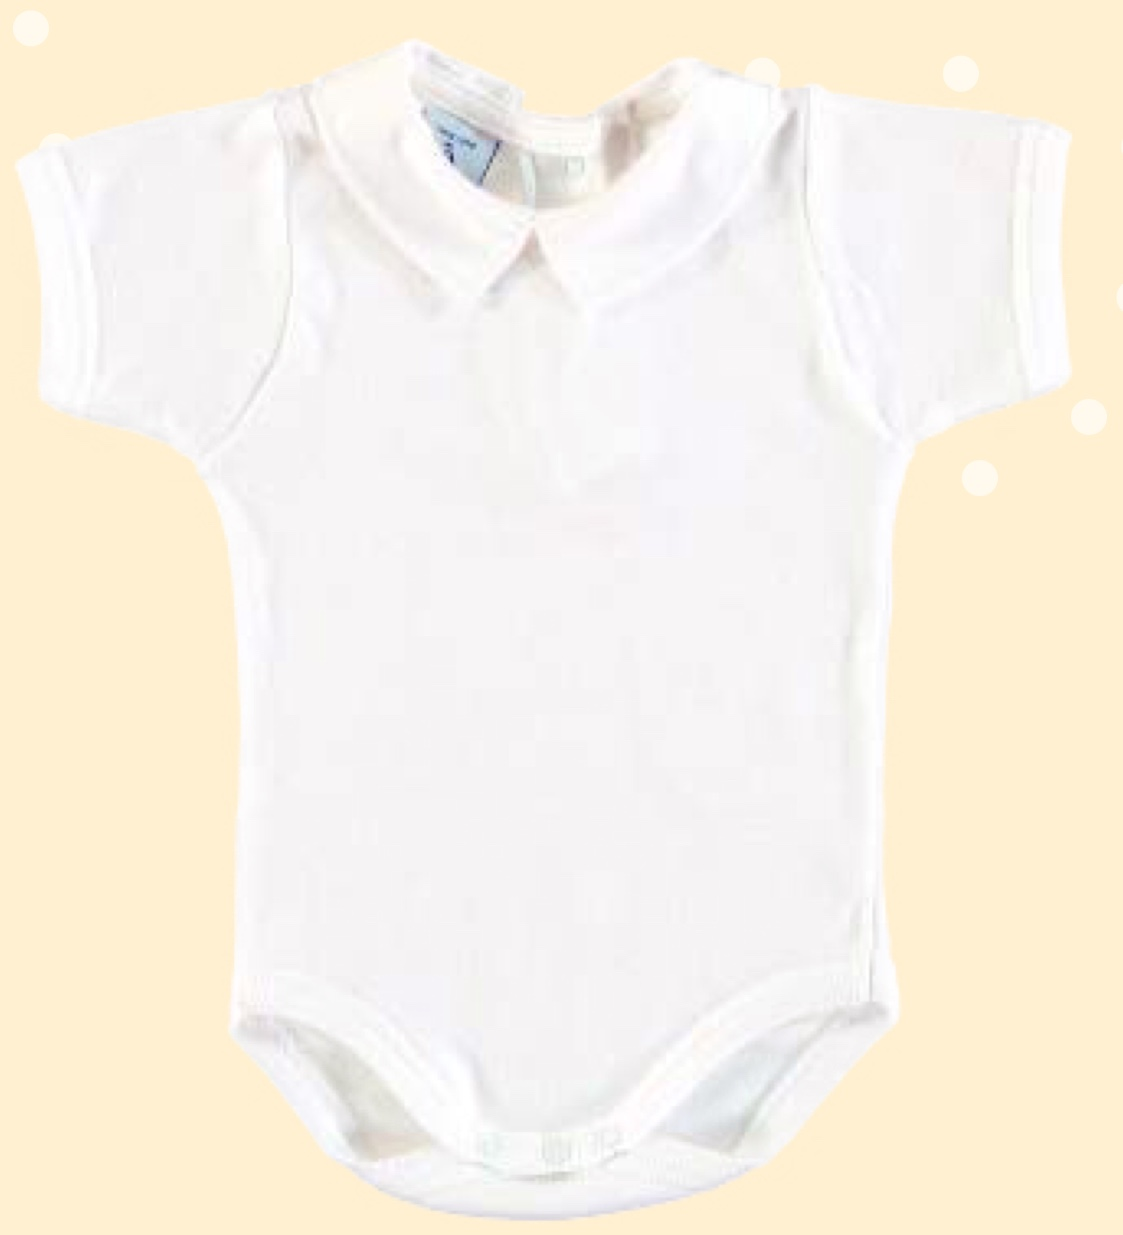 cc2031d5a Babidu Baby White Body with All White Peter Pan Collar | Briannagh ...